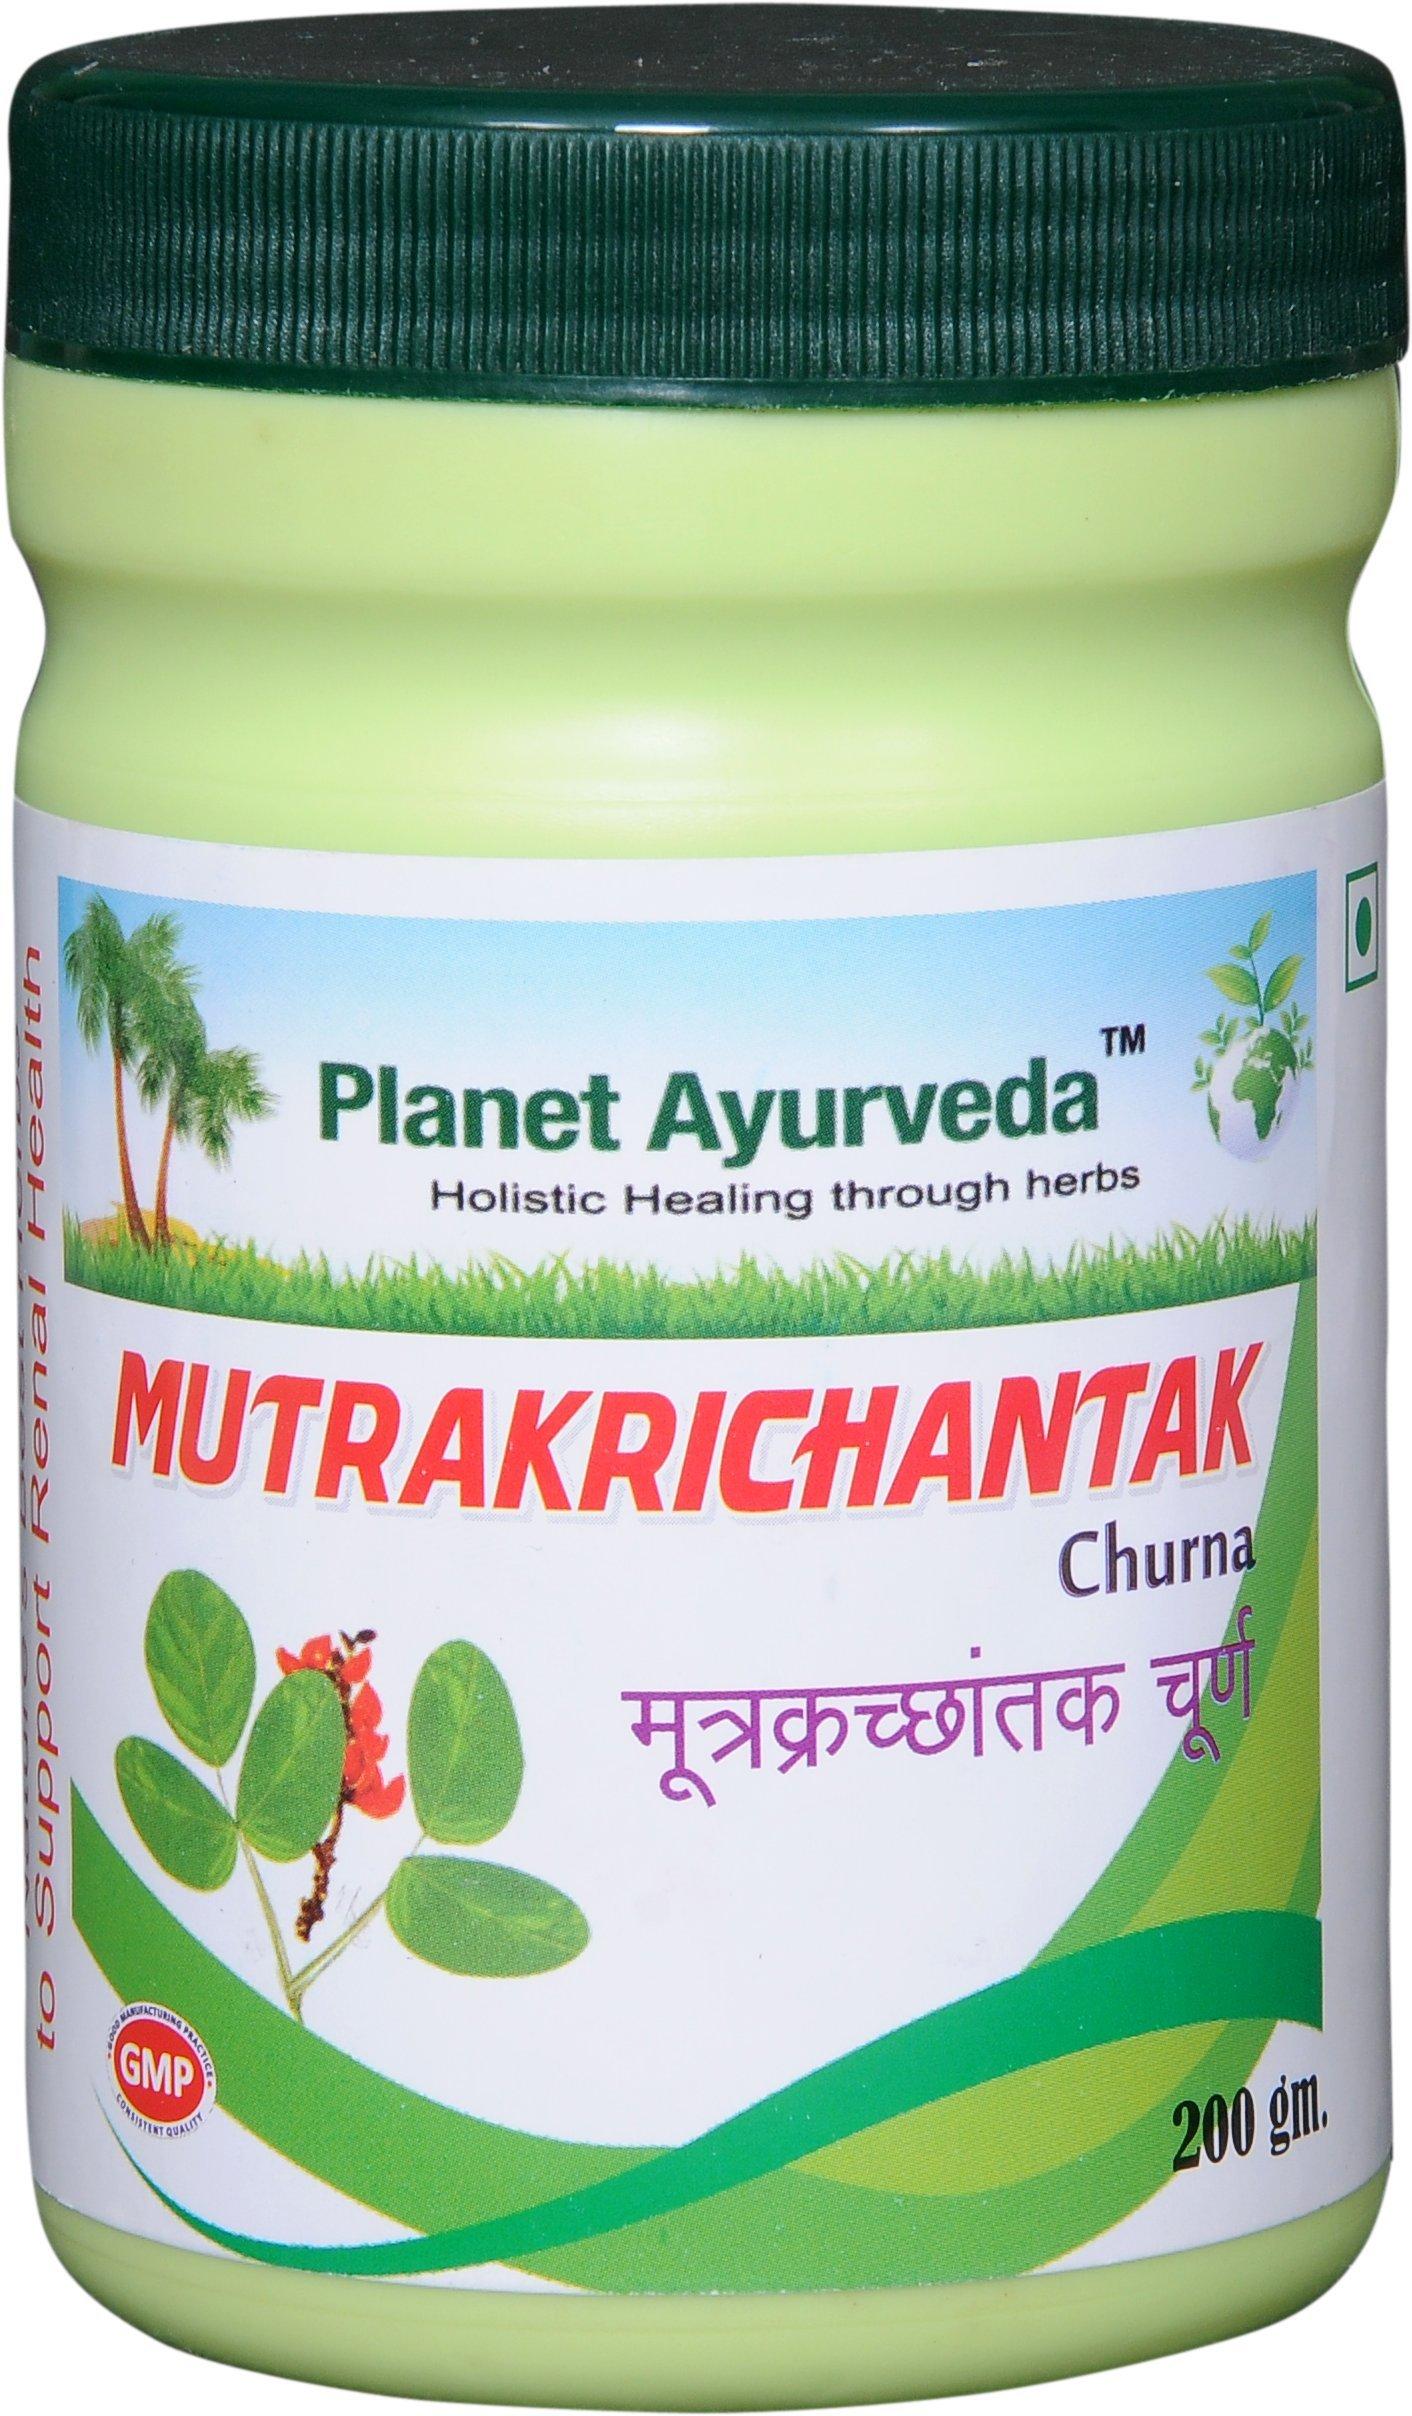 Planet Ayurveda Mutrakrichantak Churna, 200 Grams; 2 Jars